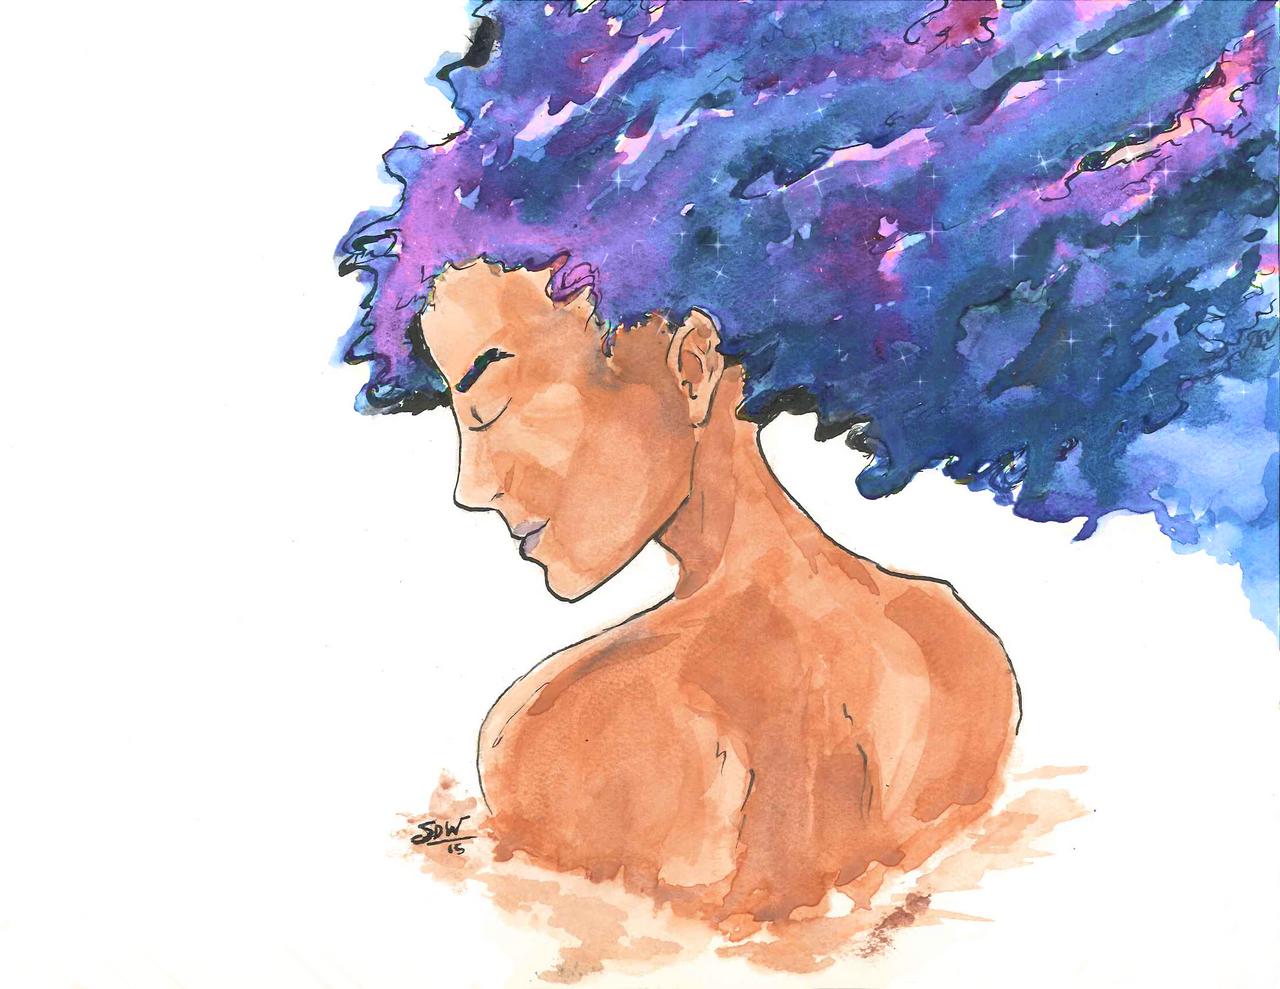 Nebulae by QueenAravis